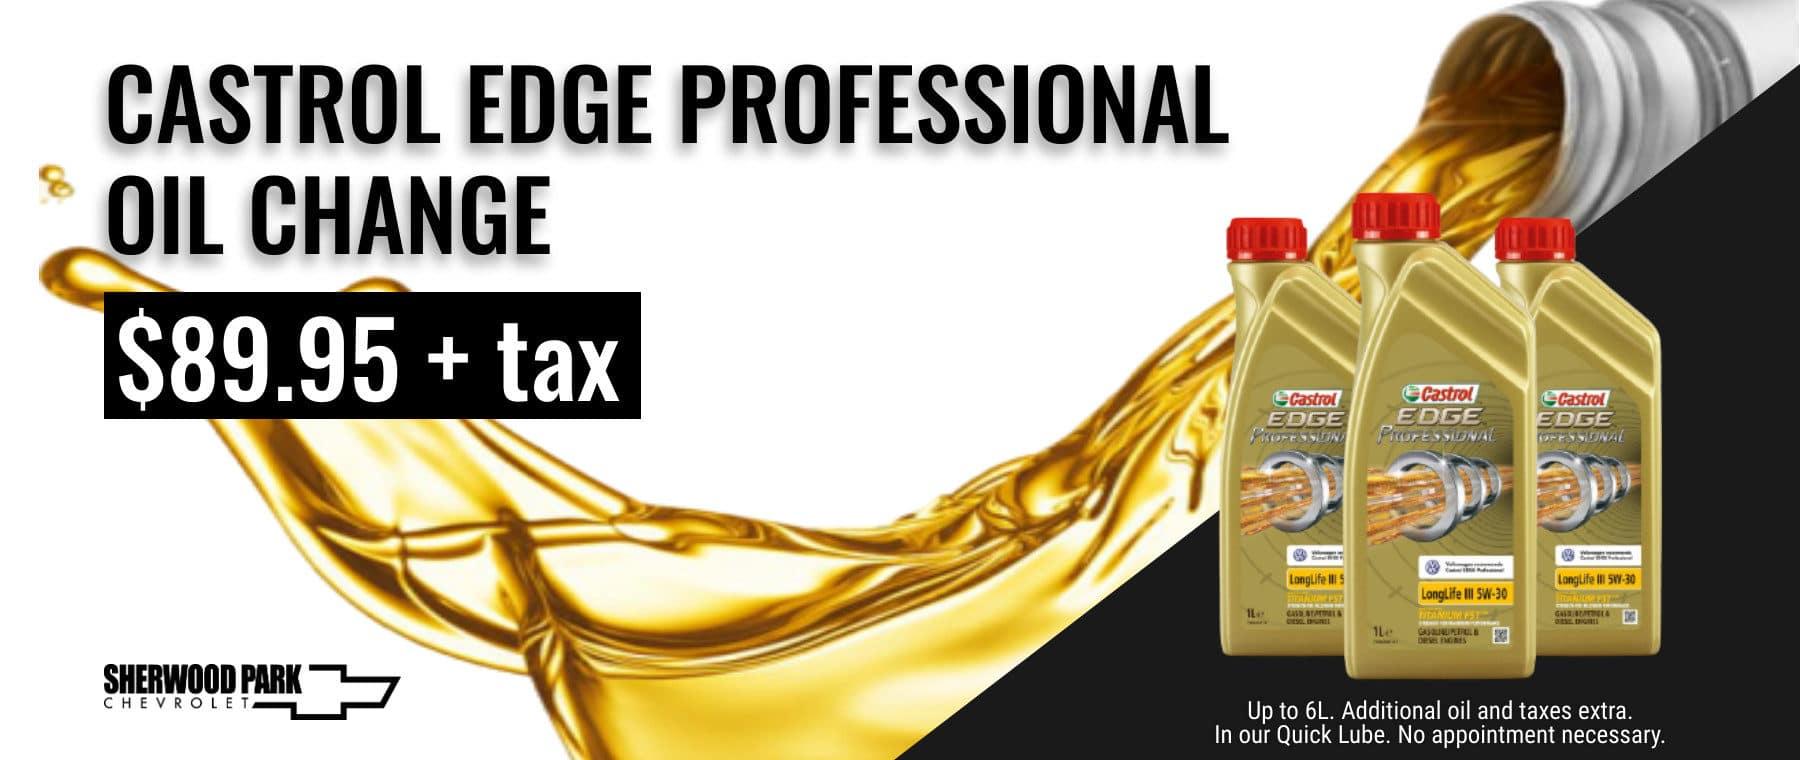 SPC – Castrol Oil Change-1800x760px-Customsize2-High-Quality